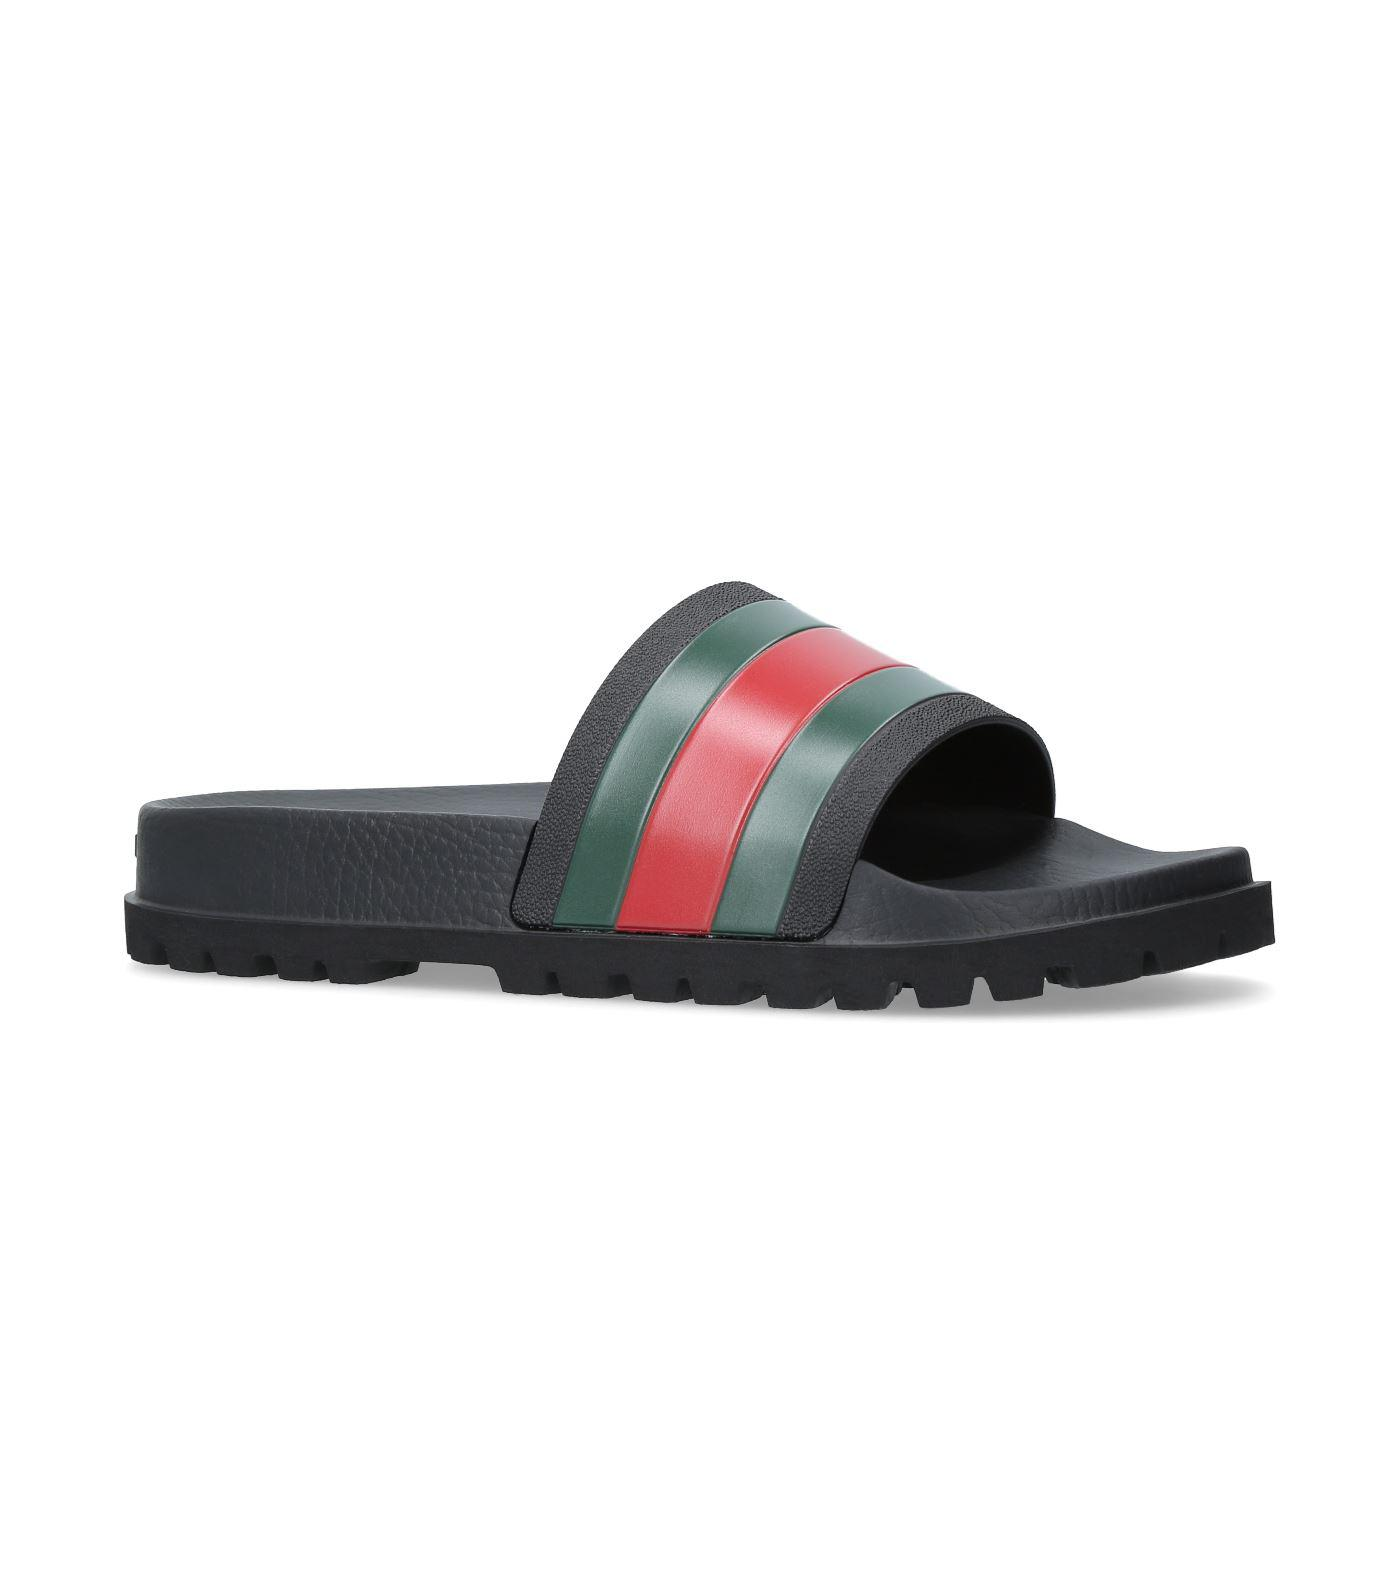 fde1bfa1192e7 Lyst - Gucci Pursuit 72 Rubber Slides in Black for Men - Save 32%